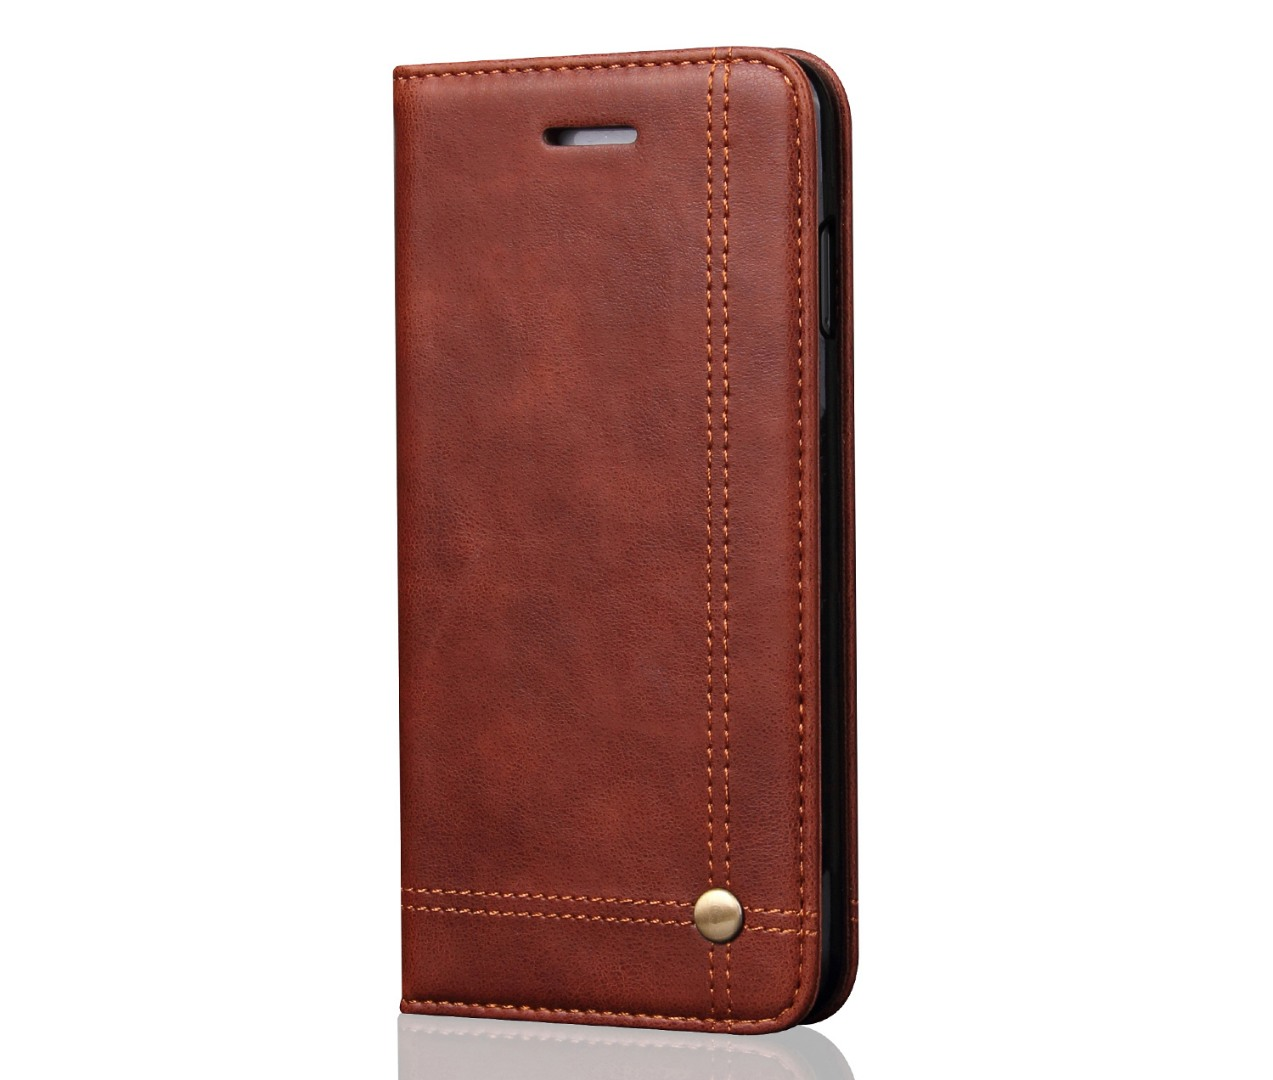 Husa piele, tip portofel, cusaturi ornamentale, stand, inchidere magnetica, iPhone 6 / 6s - CaseMe, Maro coffee